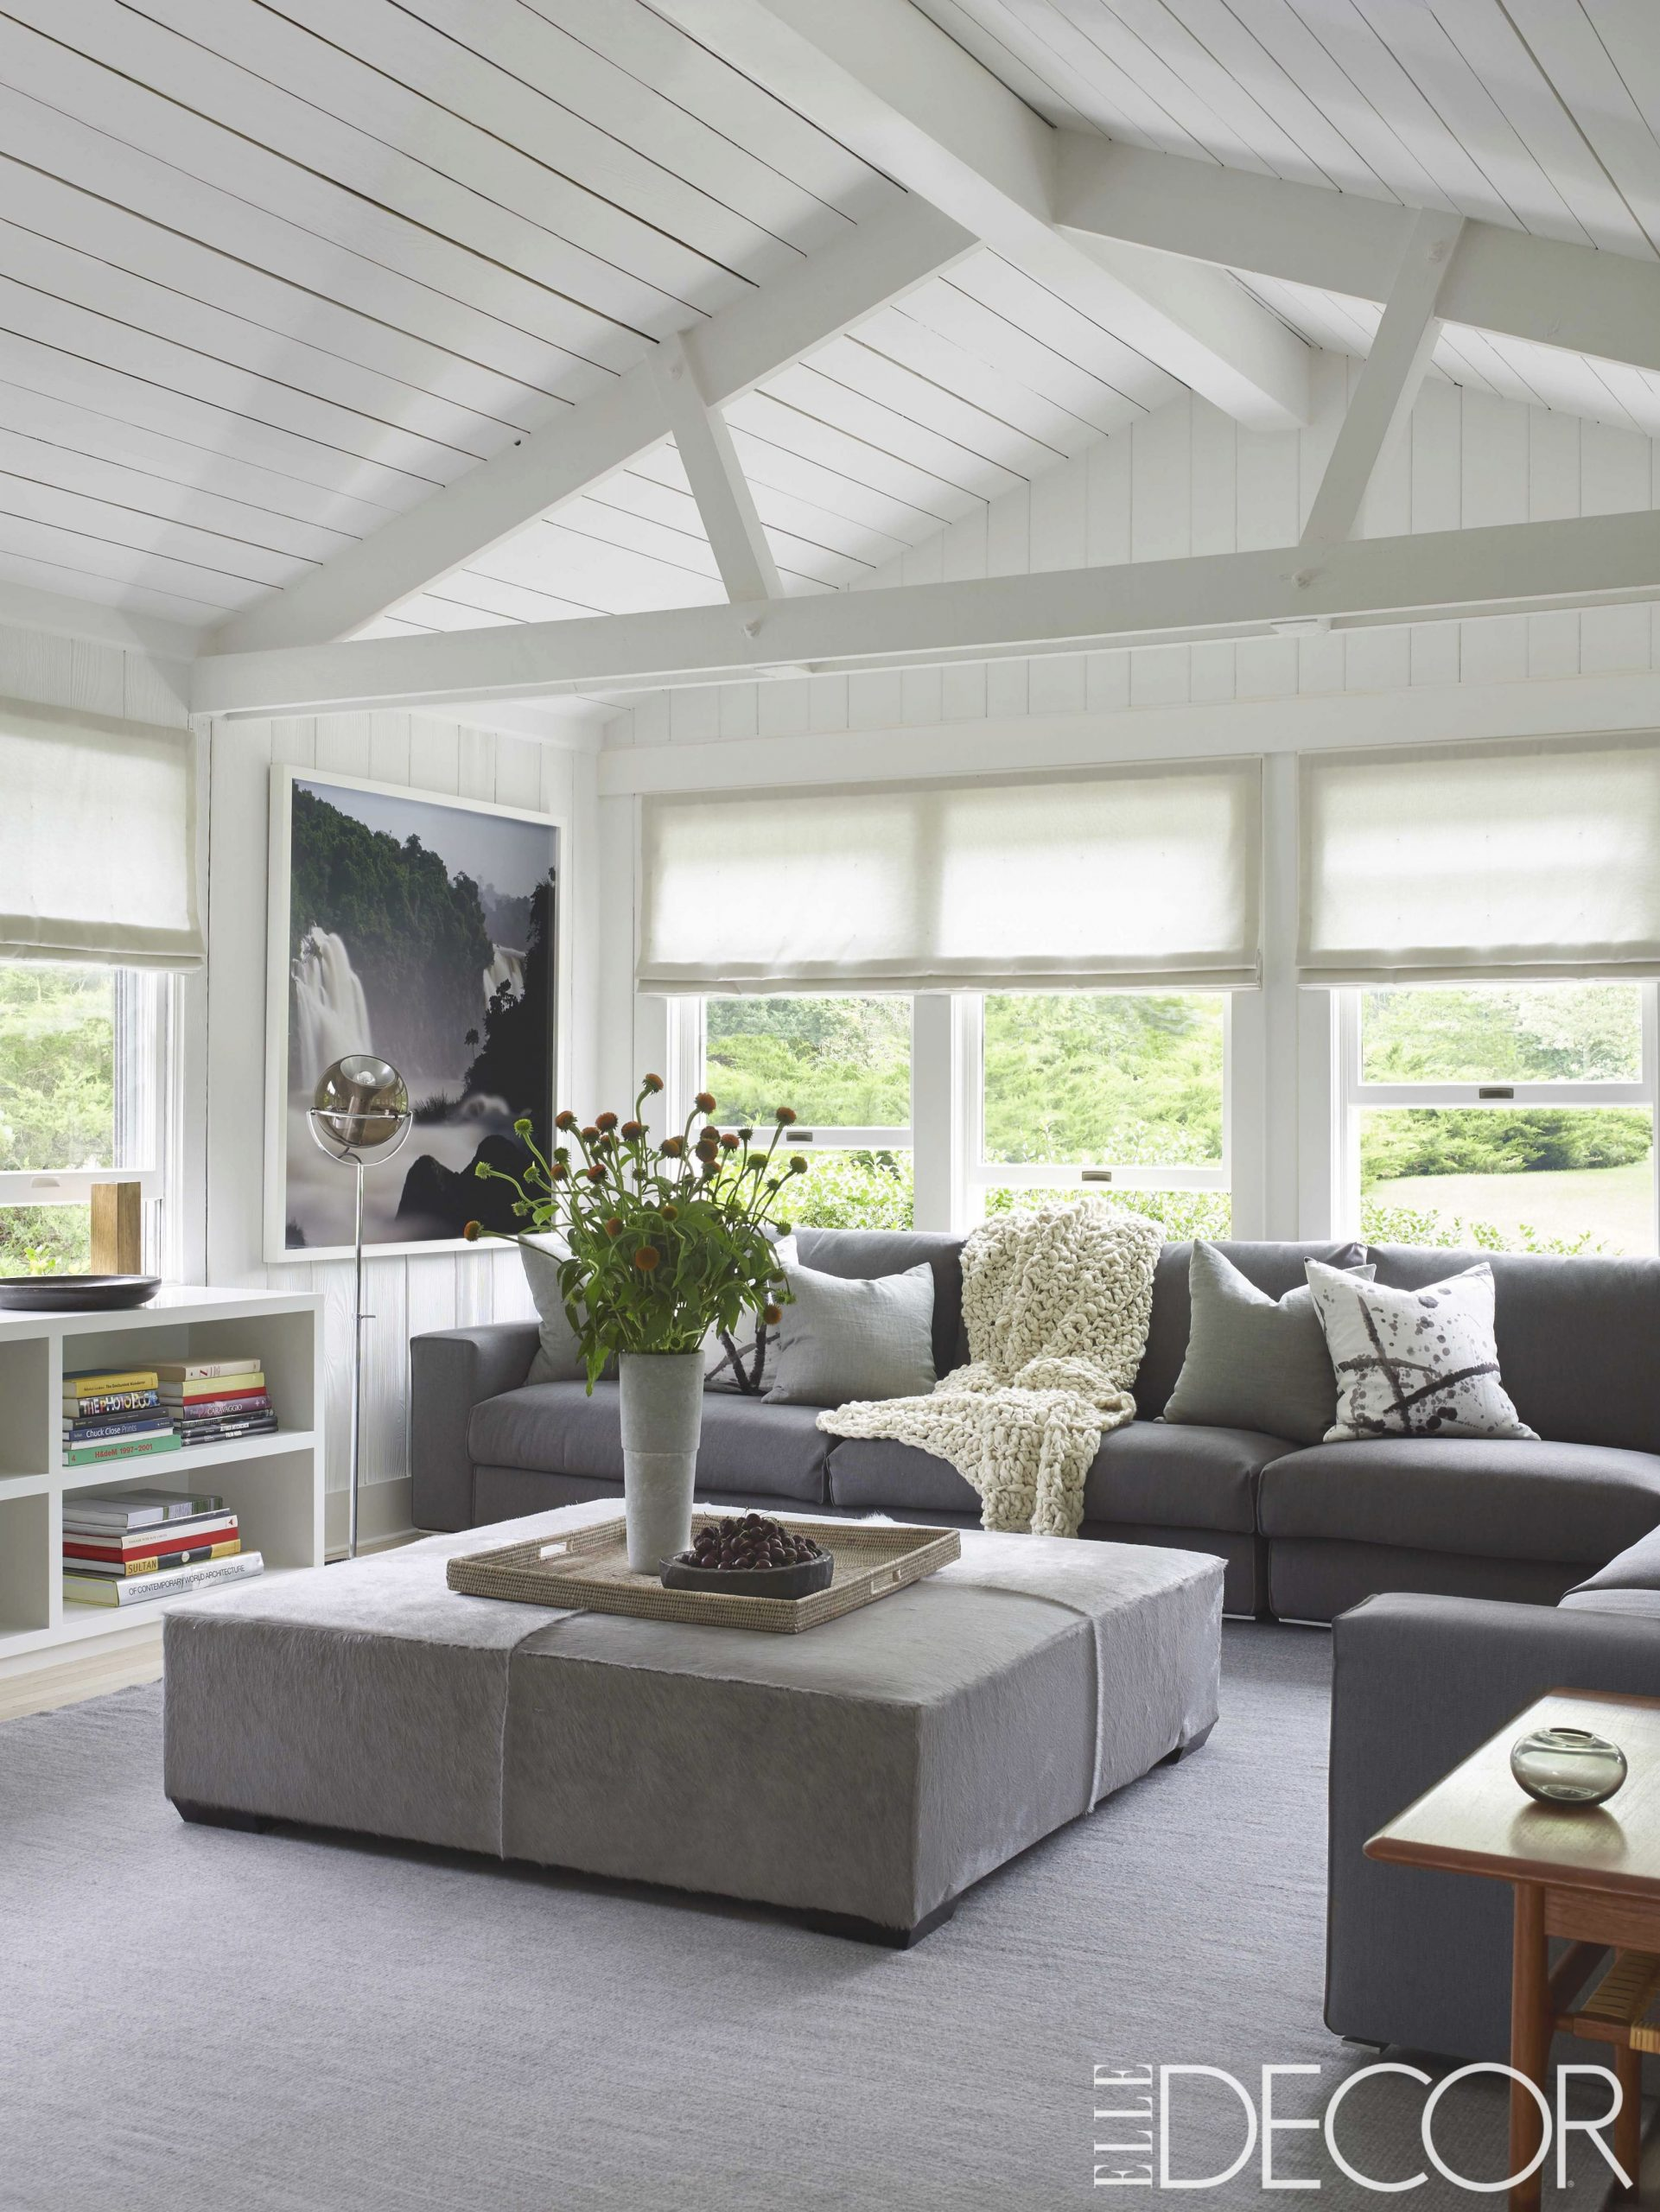 50 Gorgeous Living Room Ideas – Stylish Living Room Design intended for Sample Living Room Decor